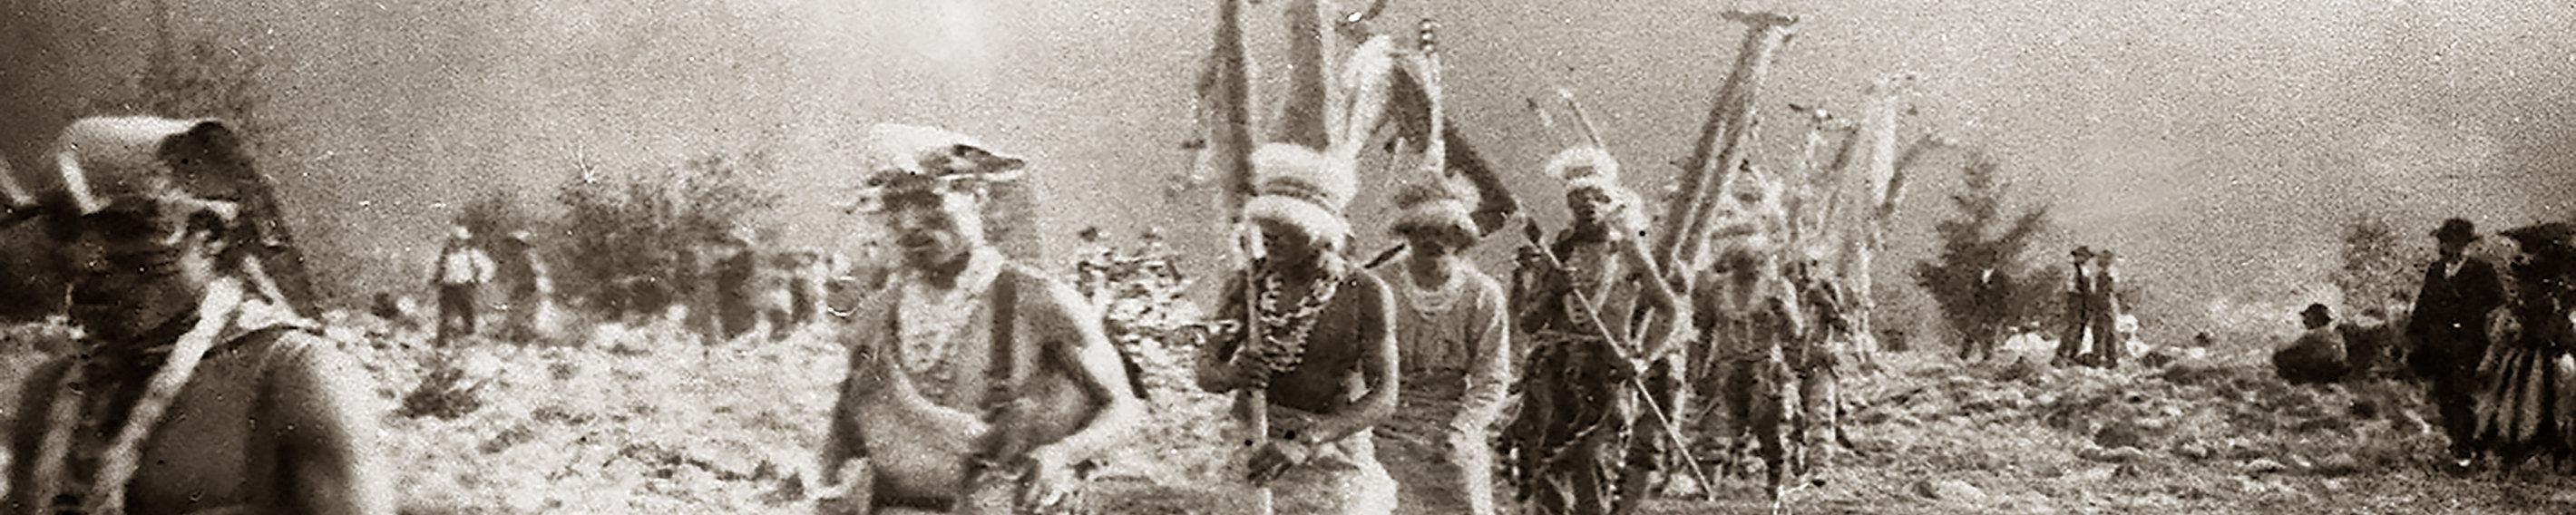 white deerskin dancers - nicholson 1923